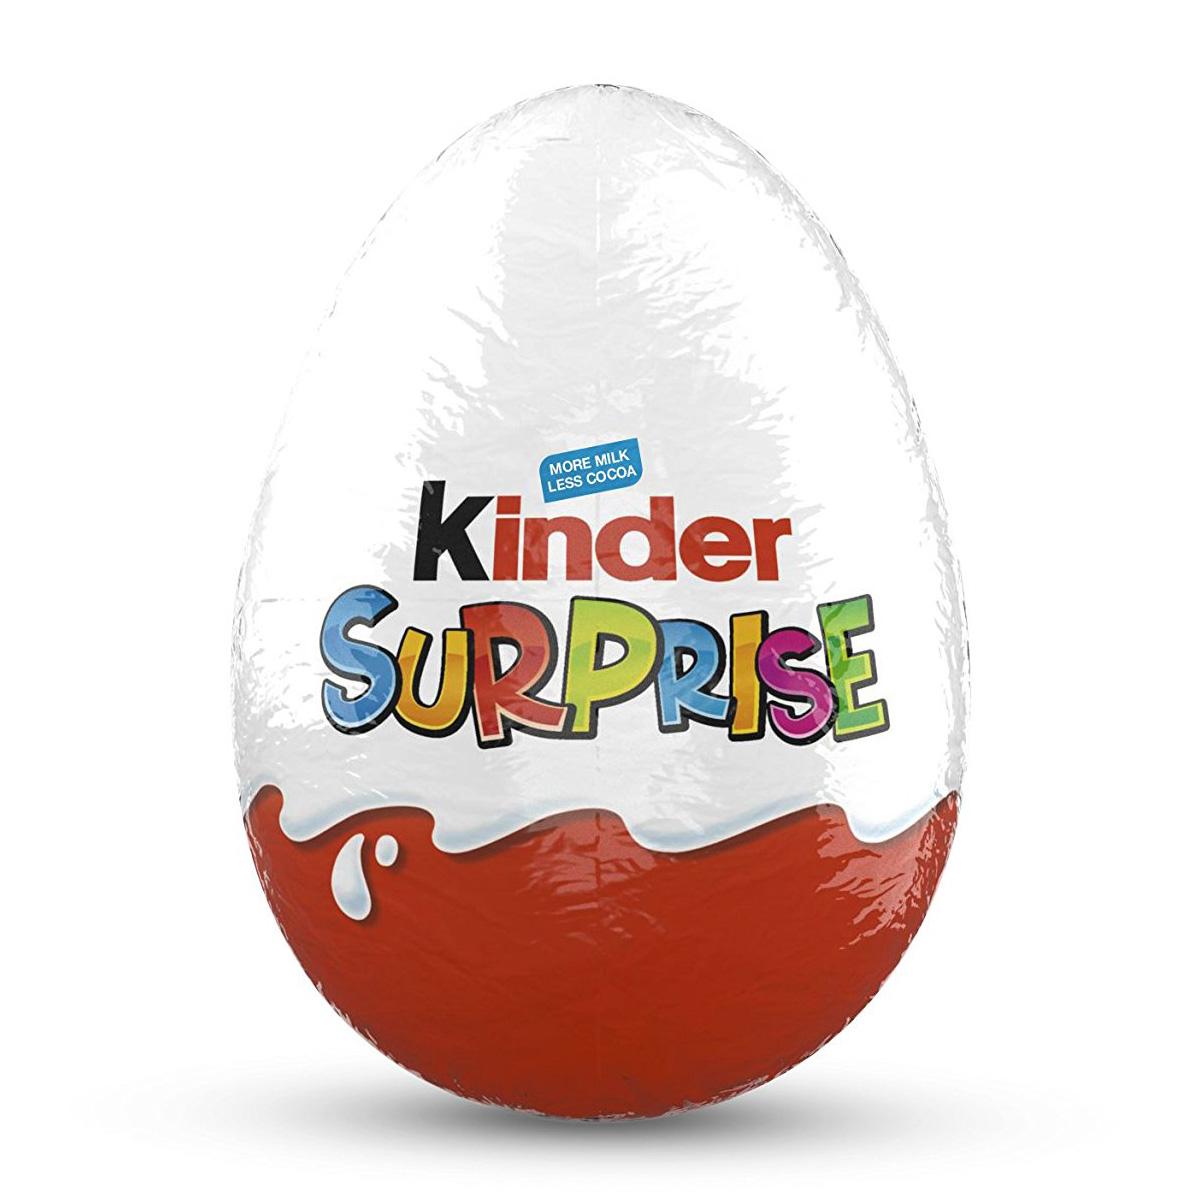 Ferrero Kinder Surprise Chocolate Egg 20g 0 7 Oz Peppery Spot